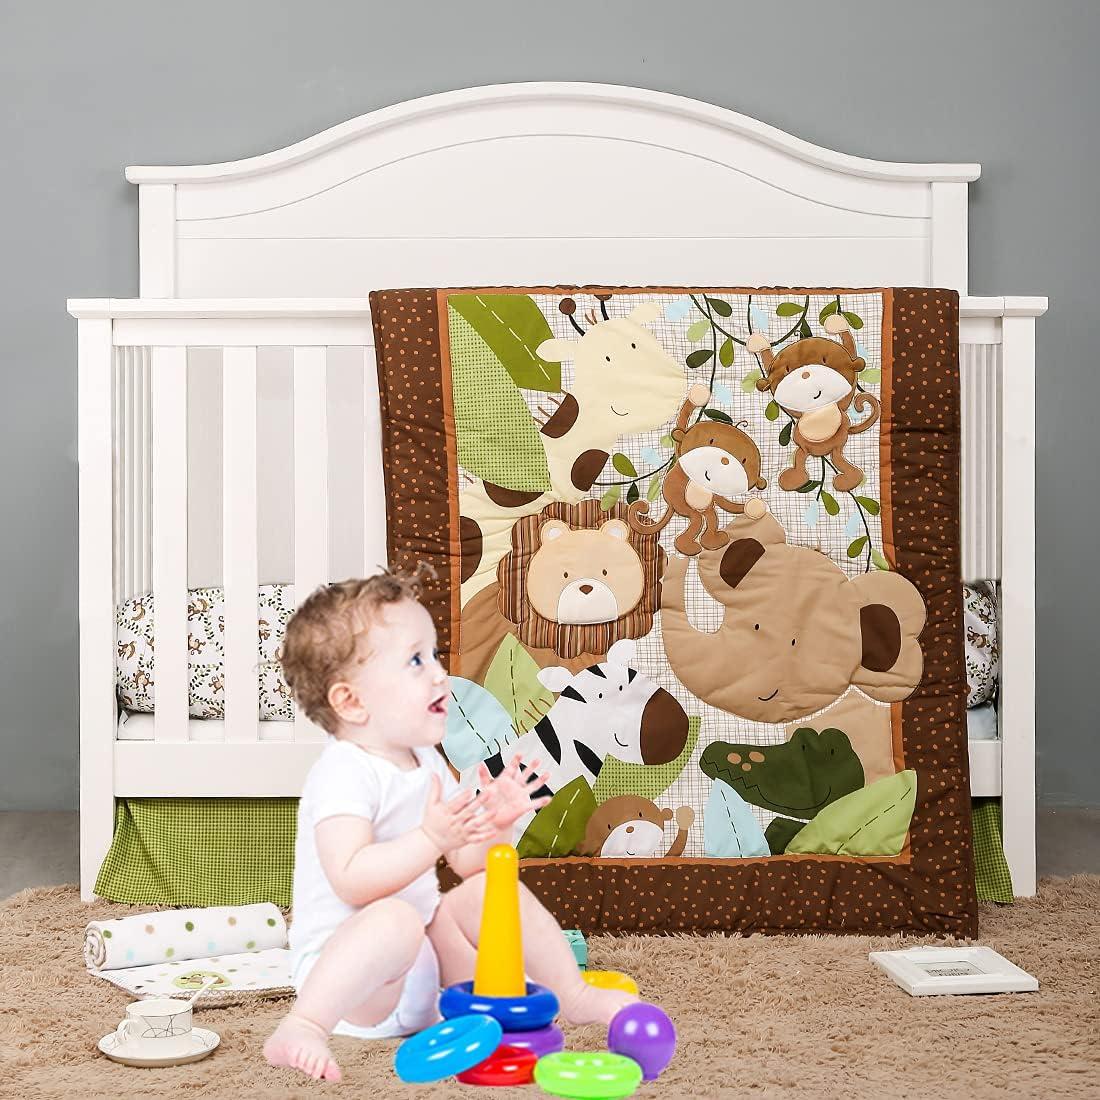 Brandream Fun Fresno Mall Forest OFFicial mail order Baby Crib Bedding Lion Zebr Set - 9-Piece